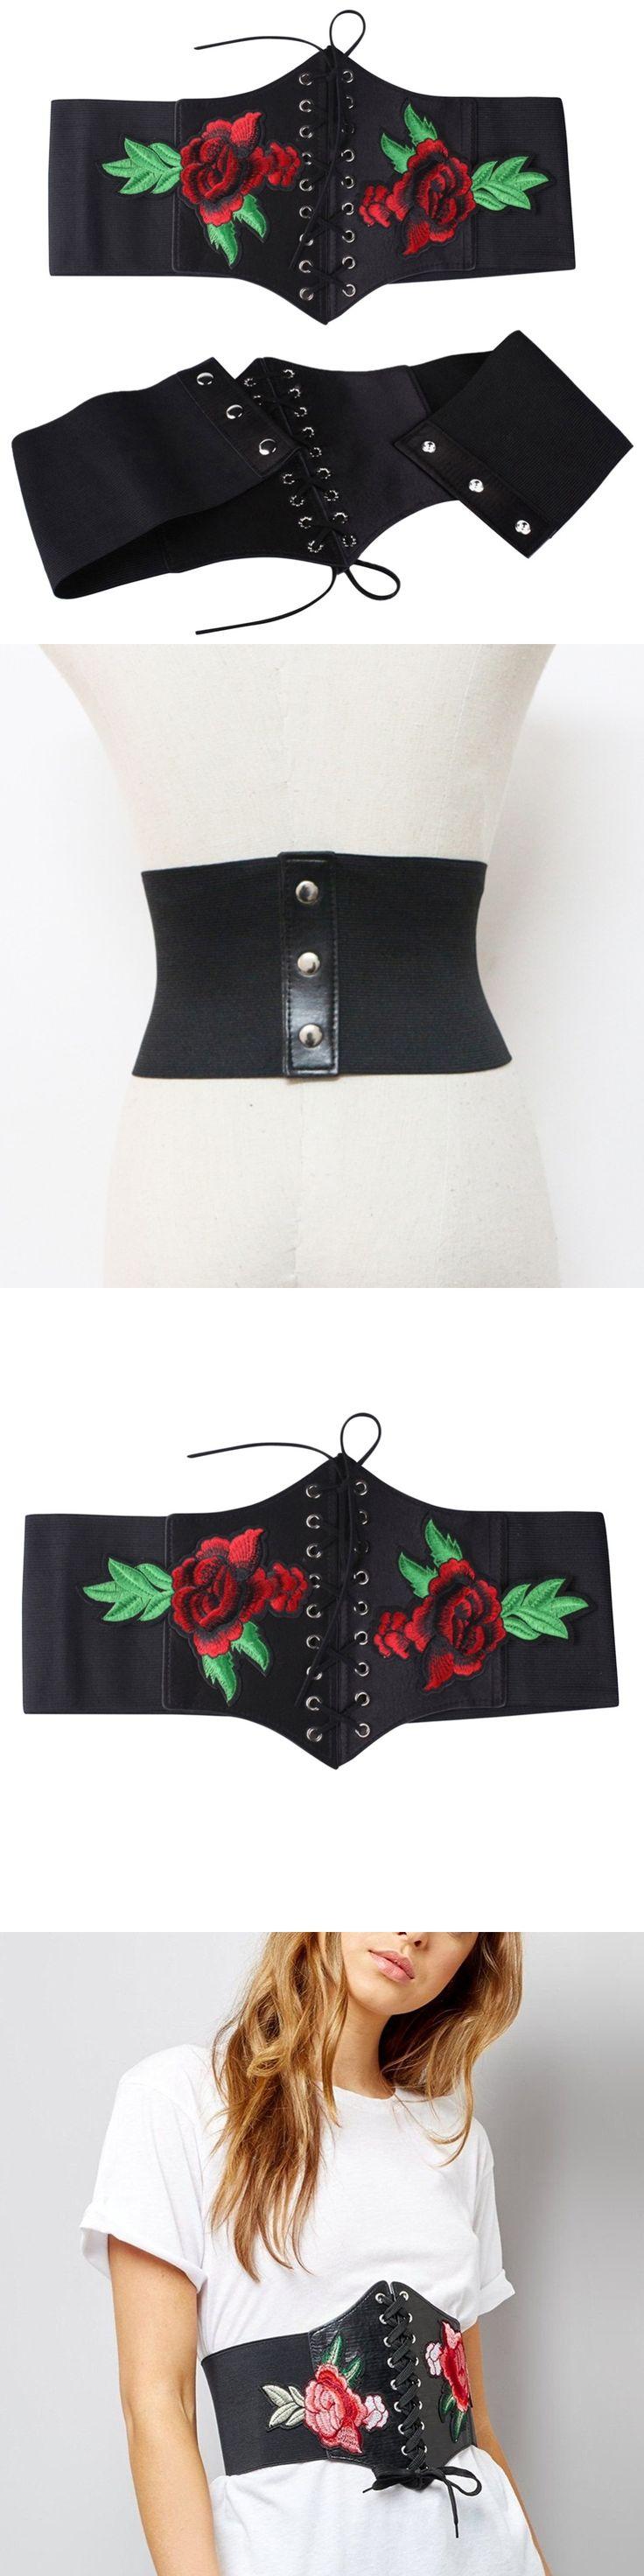 Lace Up  elastic bandage Belts Fashion Wide Adjustable Belts For Women 2017 Sexy Embroidery Casual Ceinture Femme Belt Black